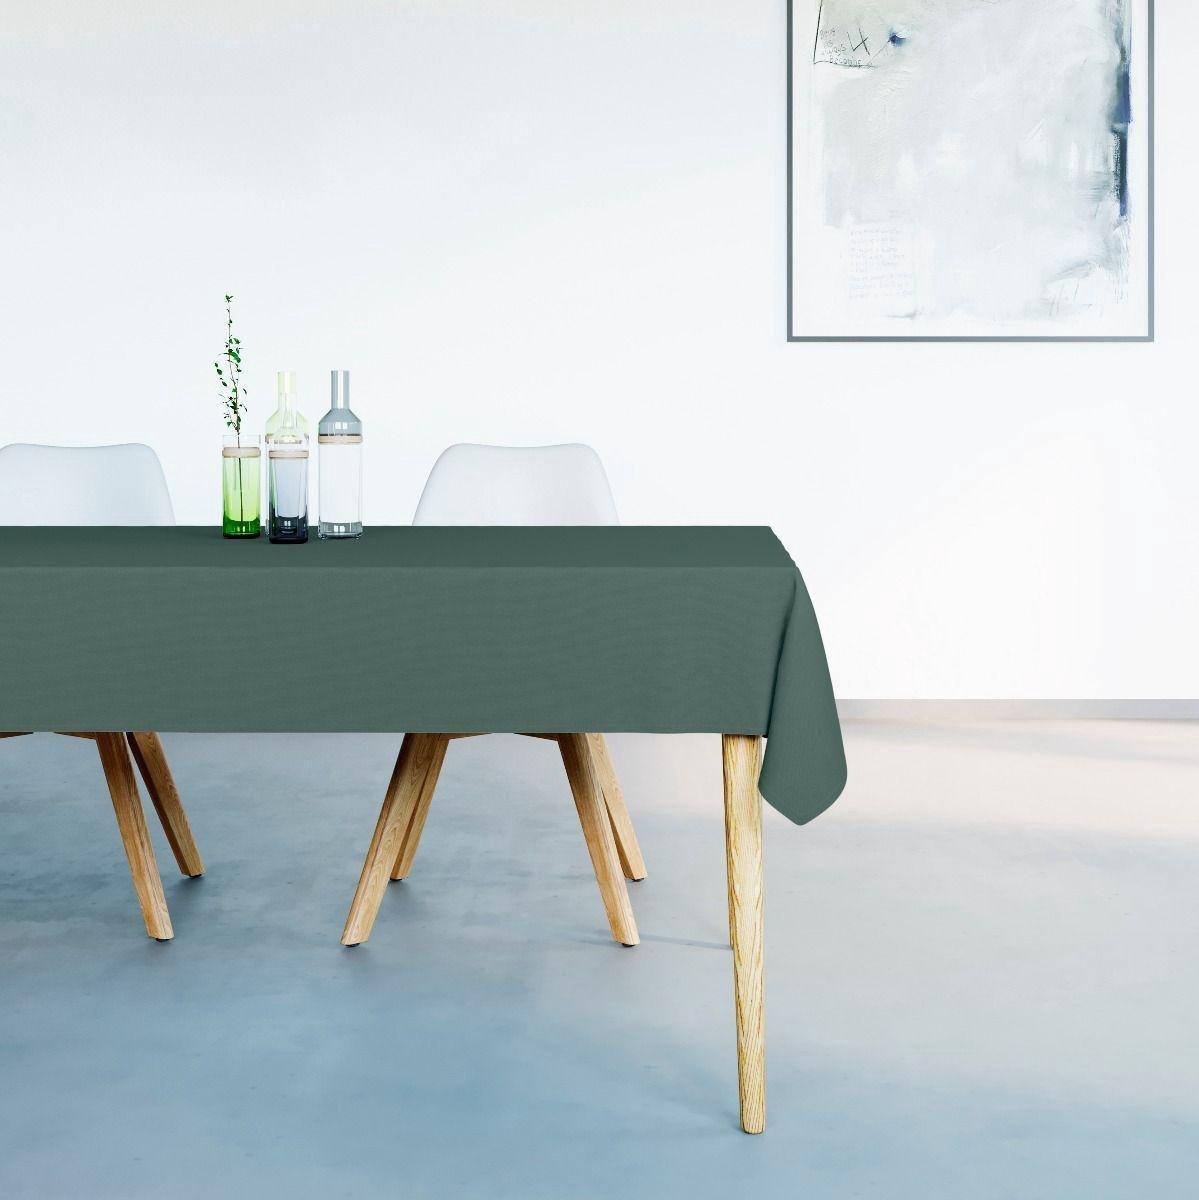 Mistral Home waterafstotend Tafelkleed - 150x250 cm - Donker Groen